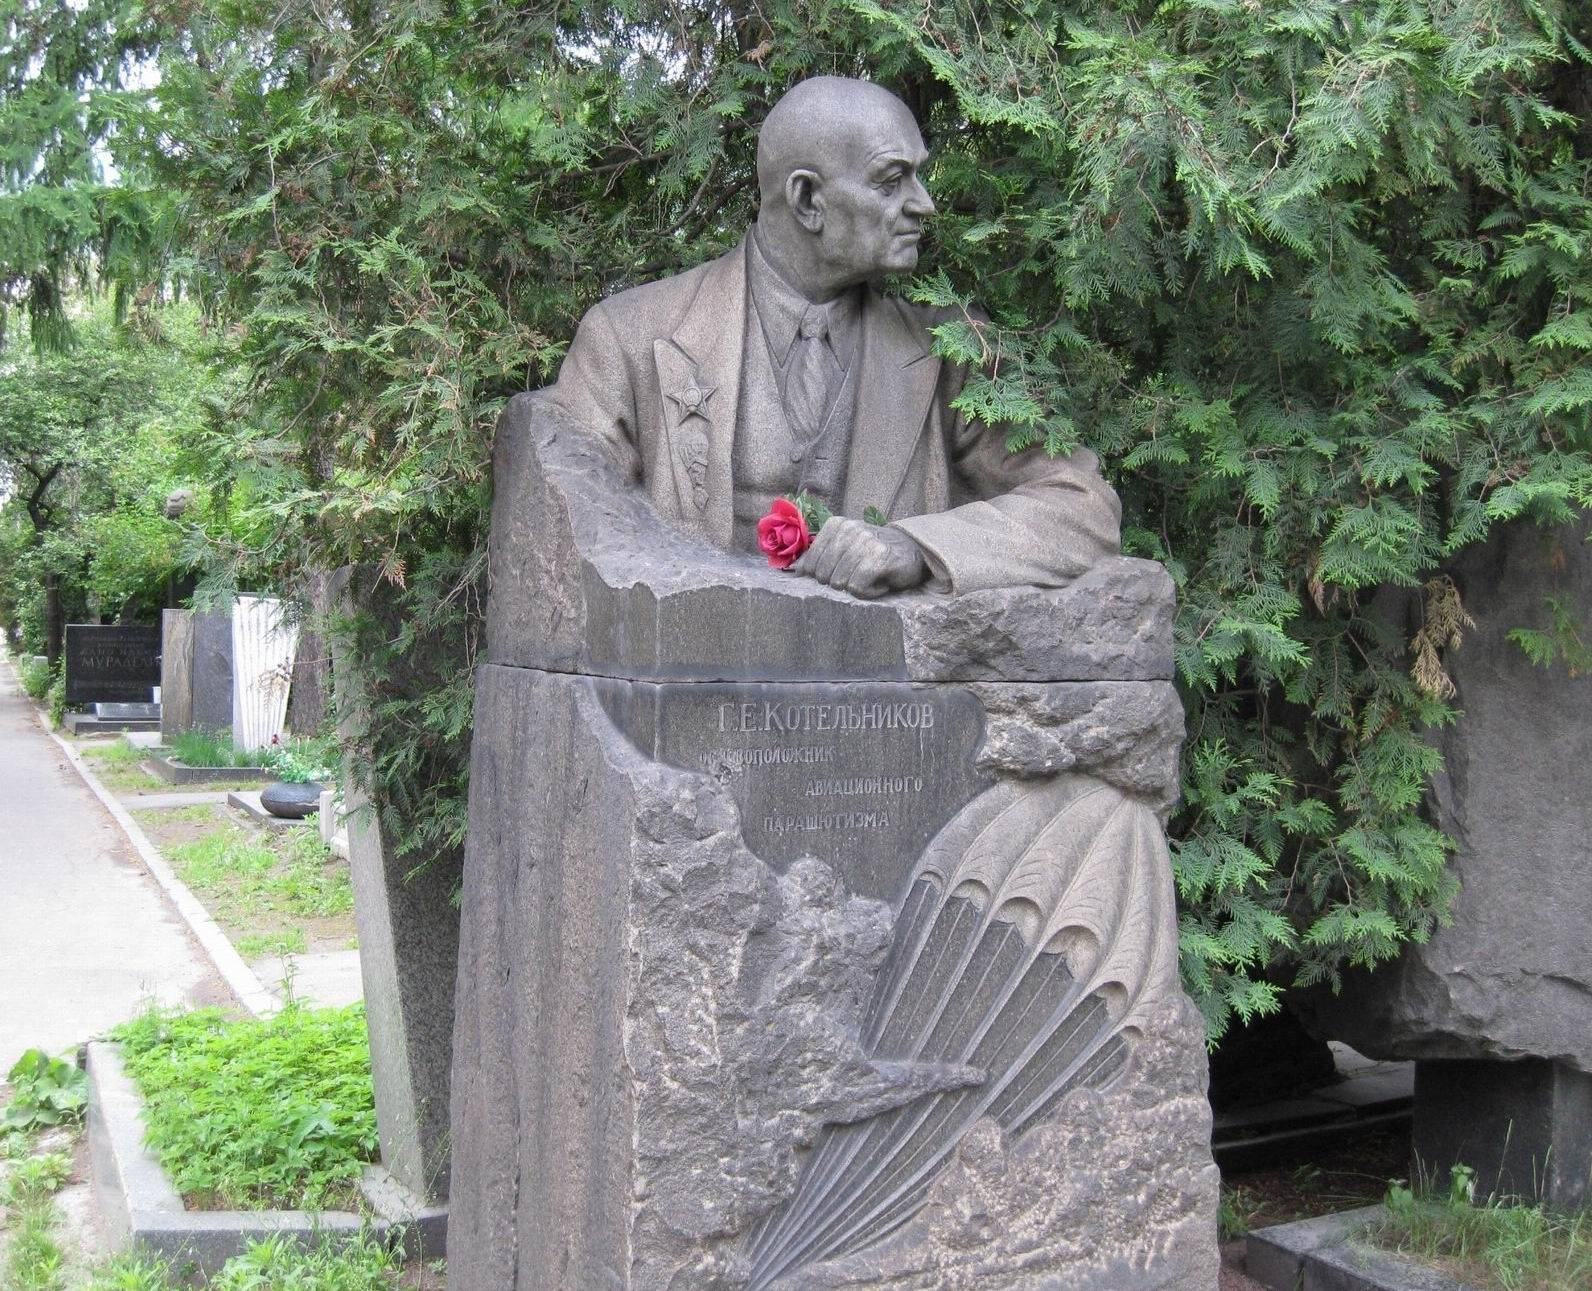 Могила Глеба Котельникова - Stone Forest